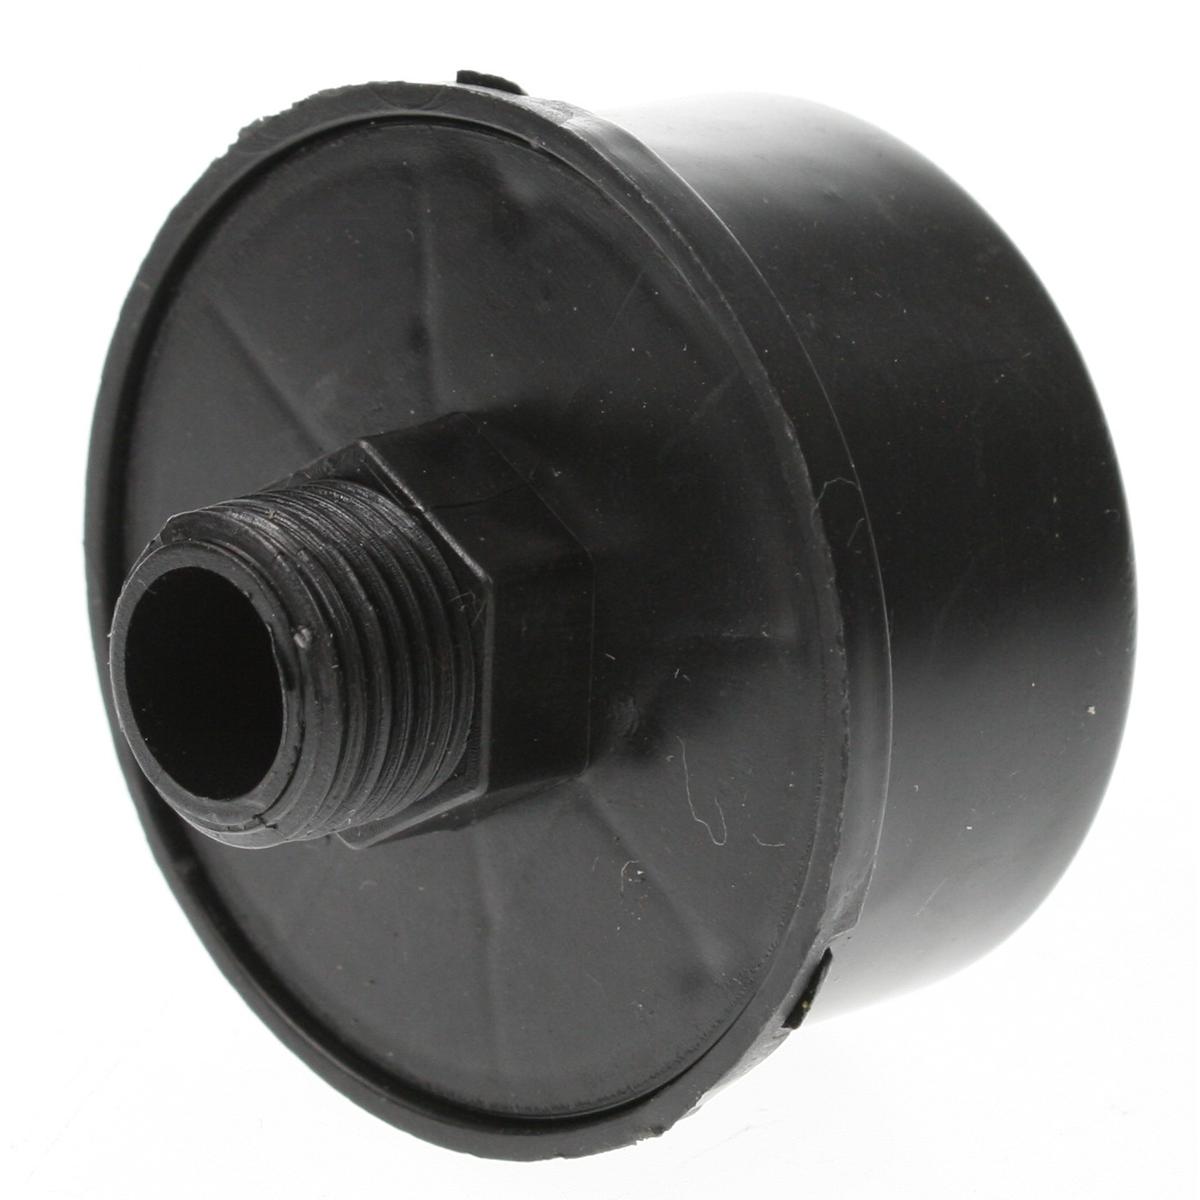 Sealey Sac2420ev2 28 Air Filter Ccw Tools